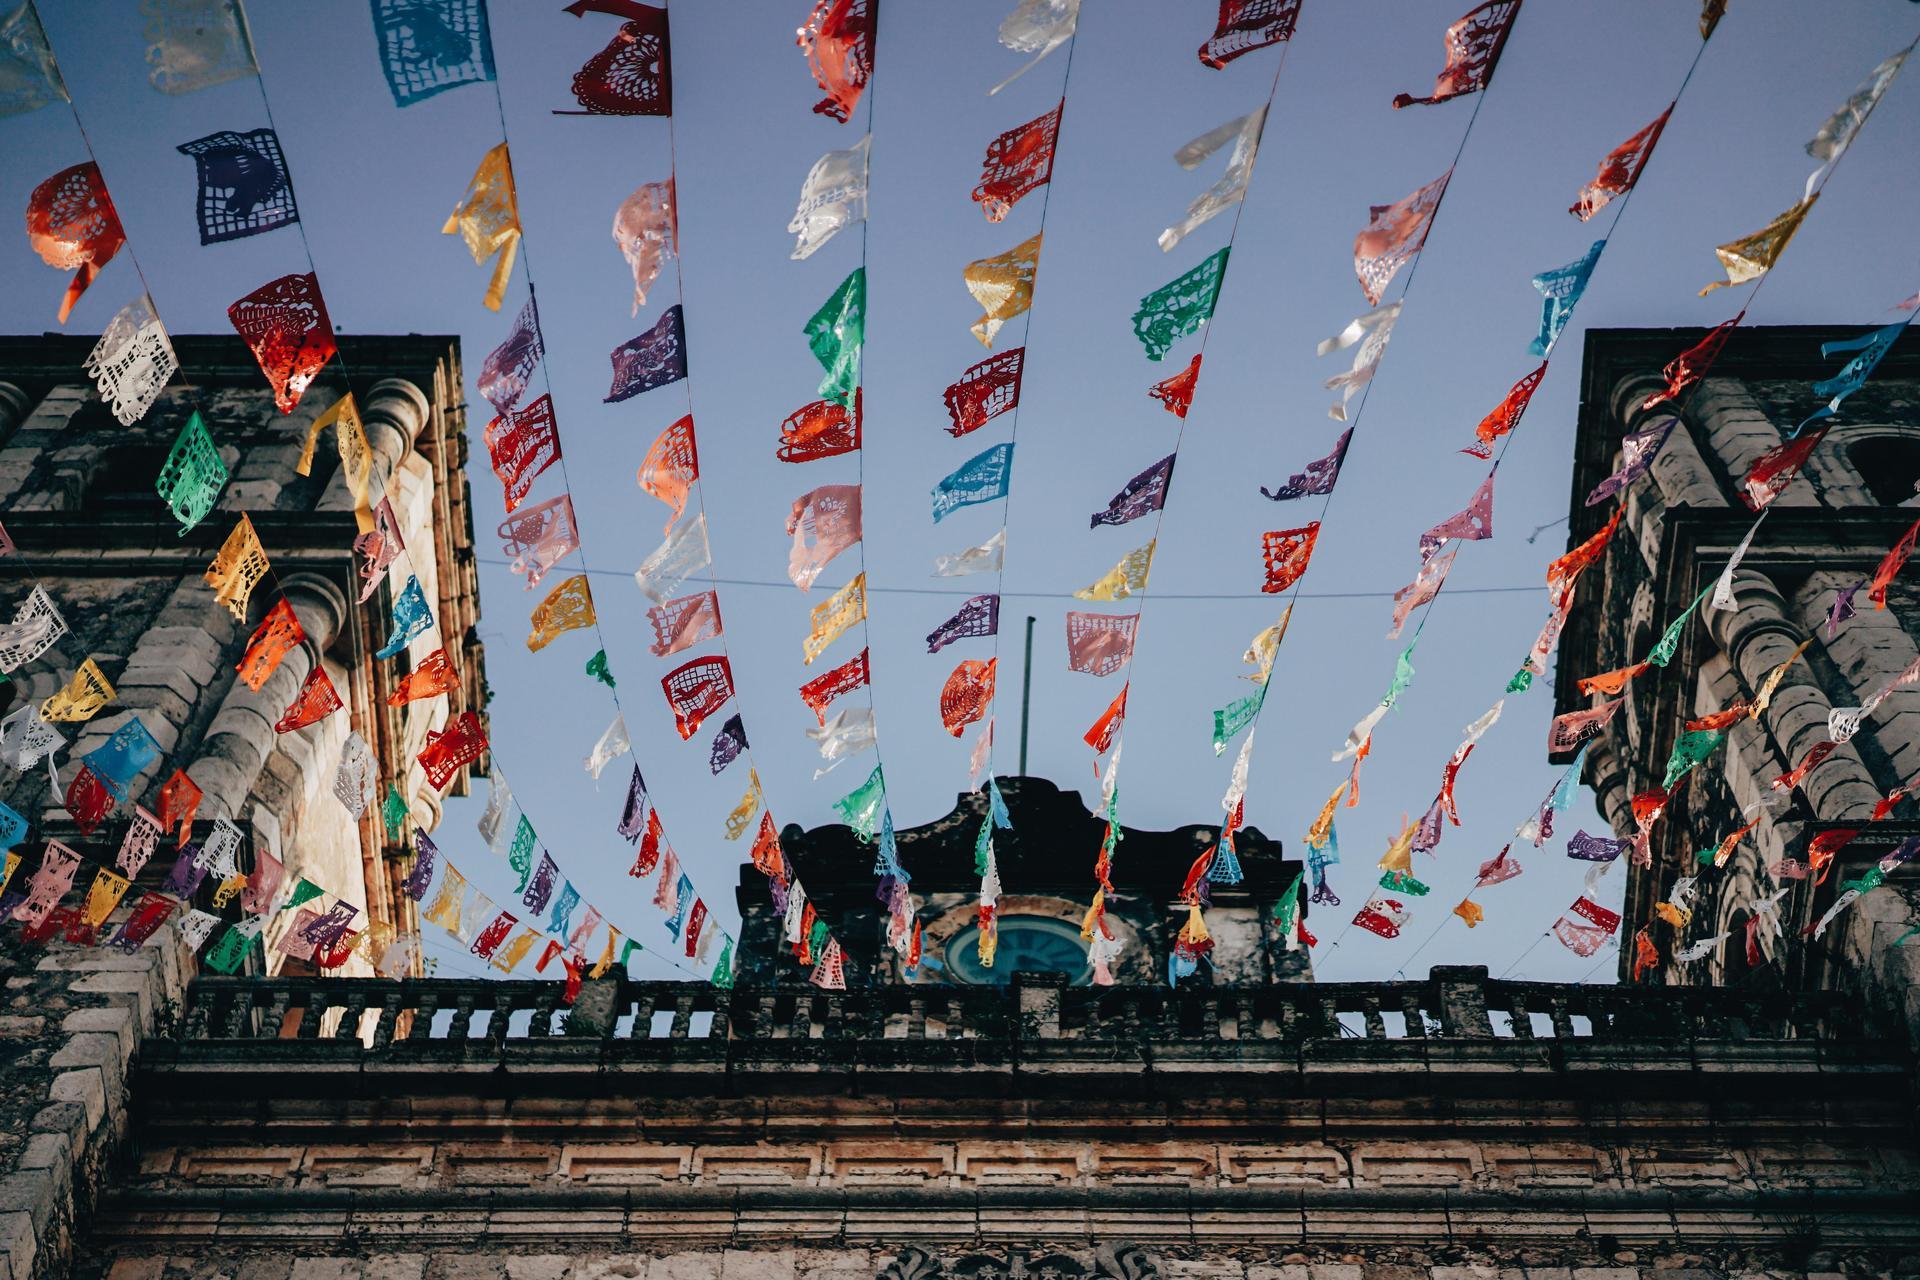 flags fluttering in a breeze